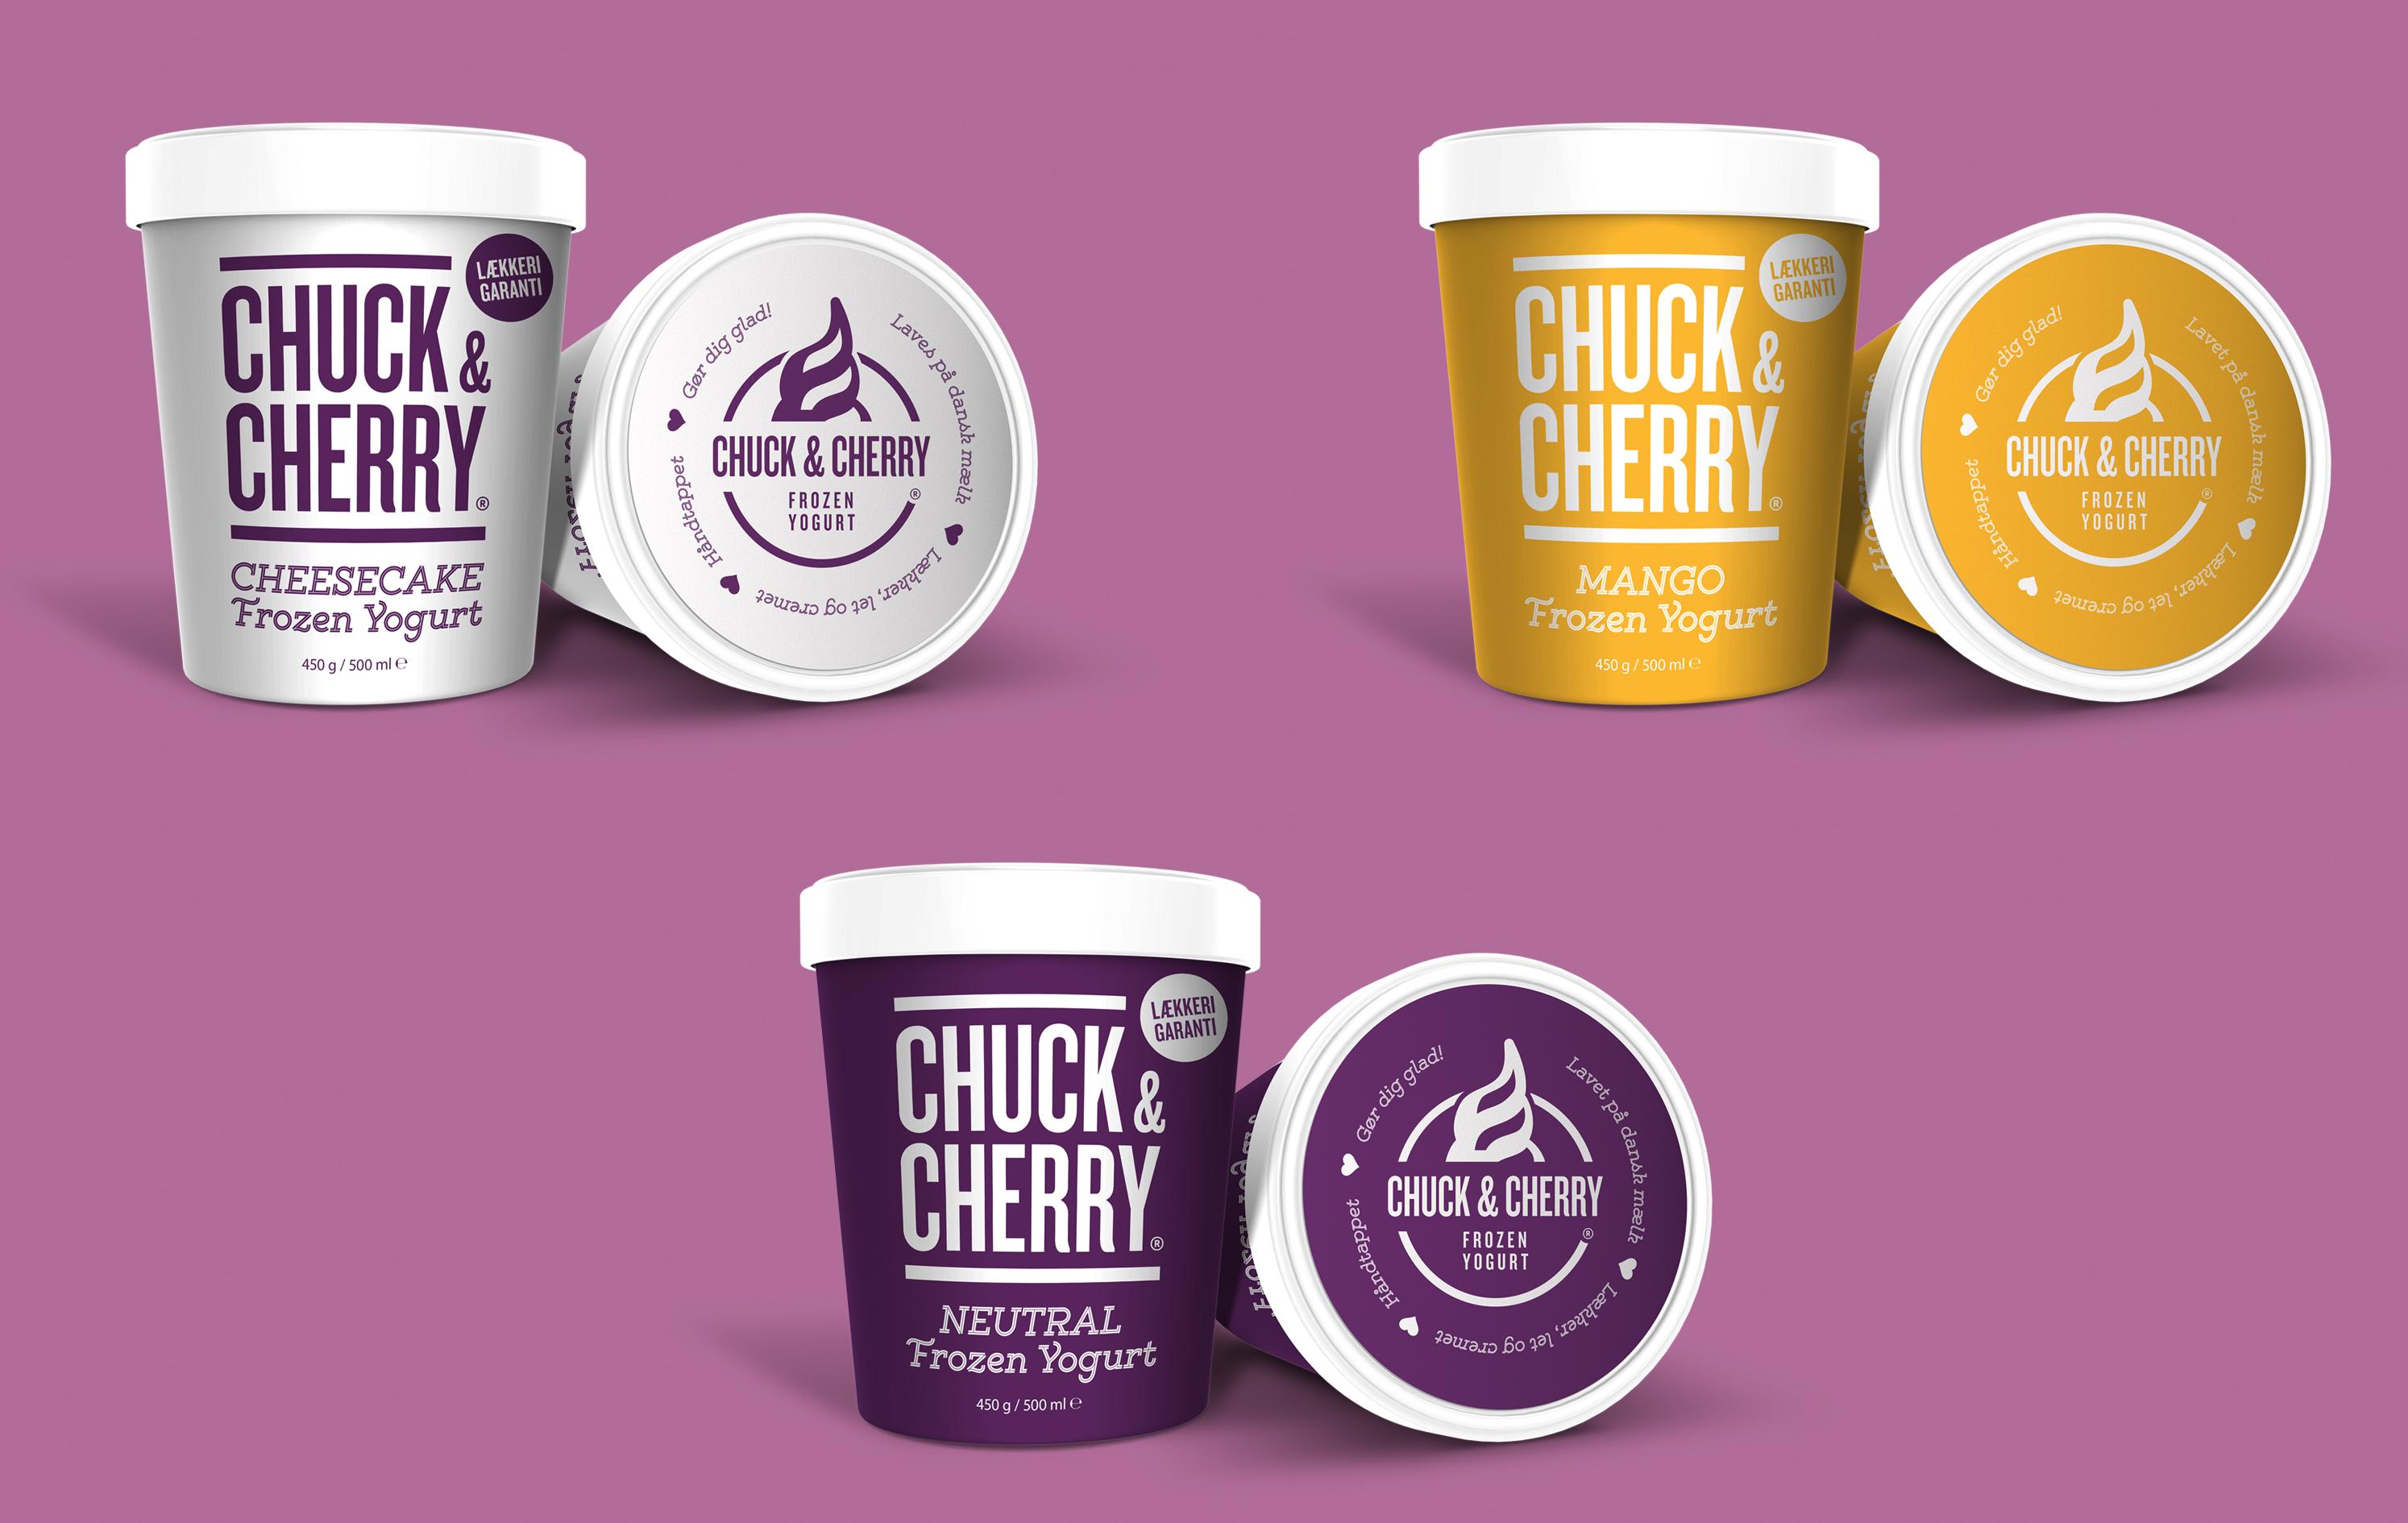 chuck-cherry-emballage